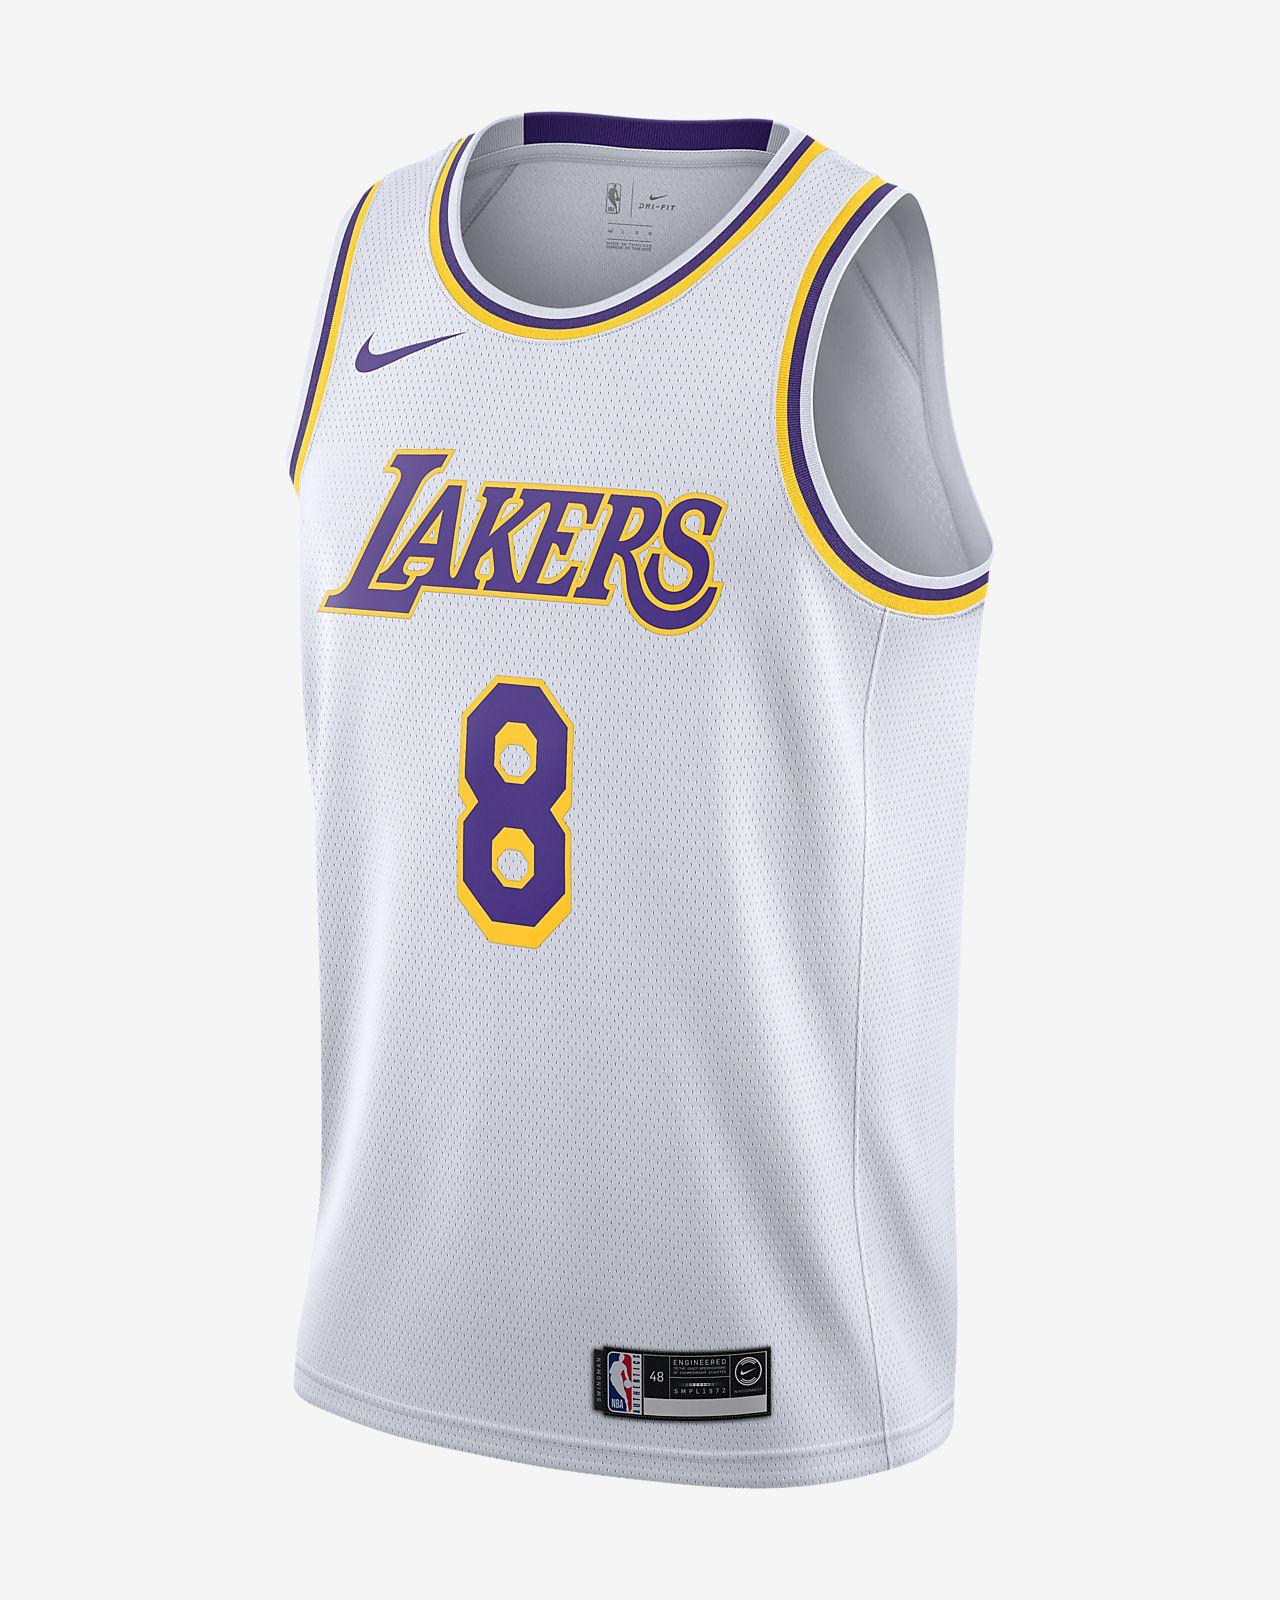 Kobe Bryant Lakers Association Edition Nike NBA Swingman Trikot